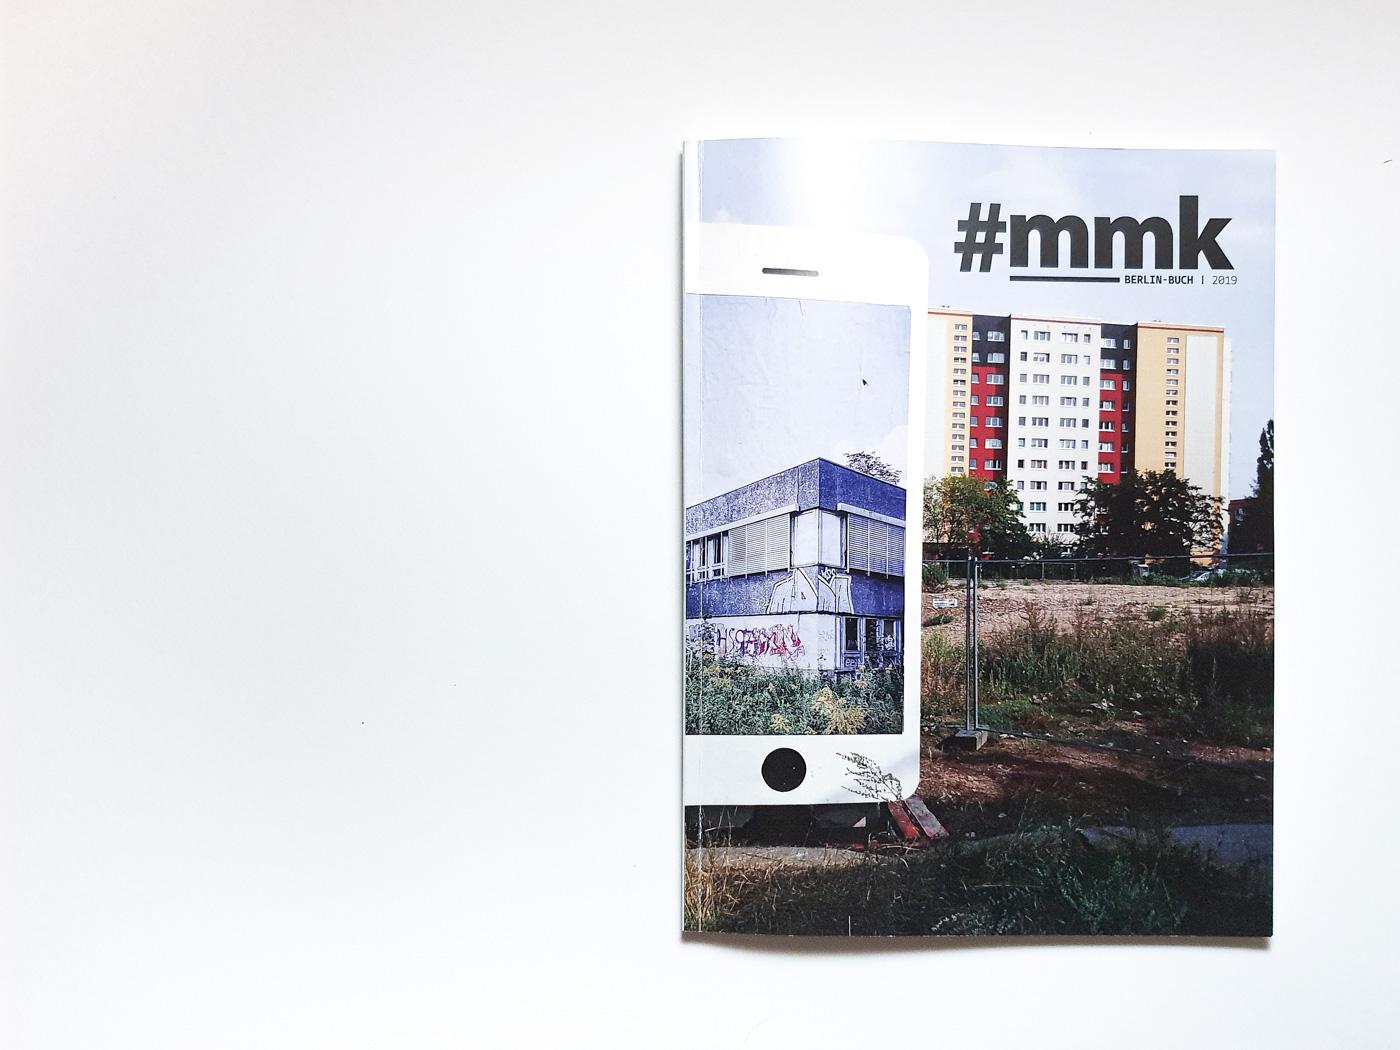 meinmeinkiez Magazin Berlin Buch 2019 | © 2020 Patrick Weseloh | weseloh.media